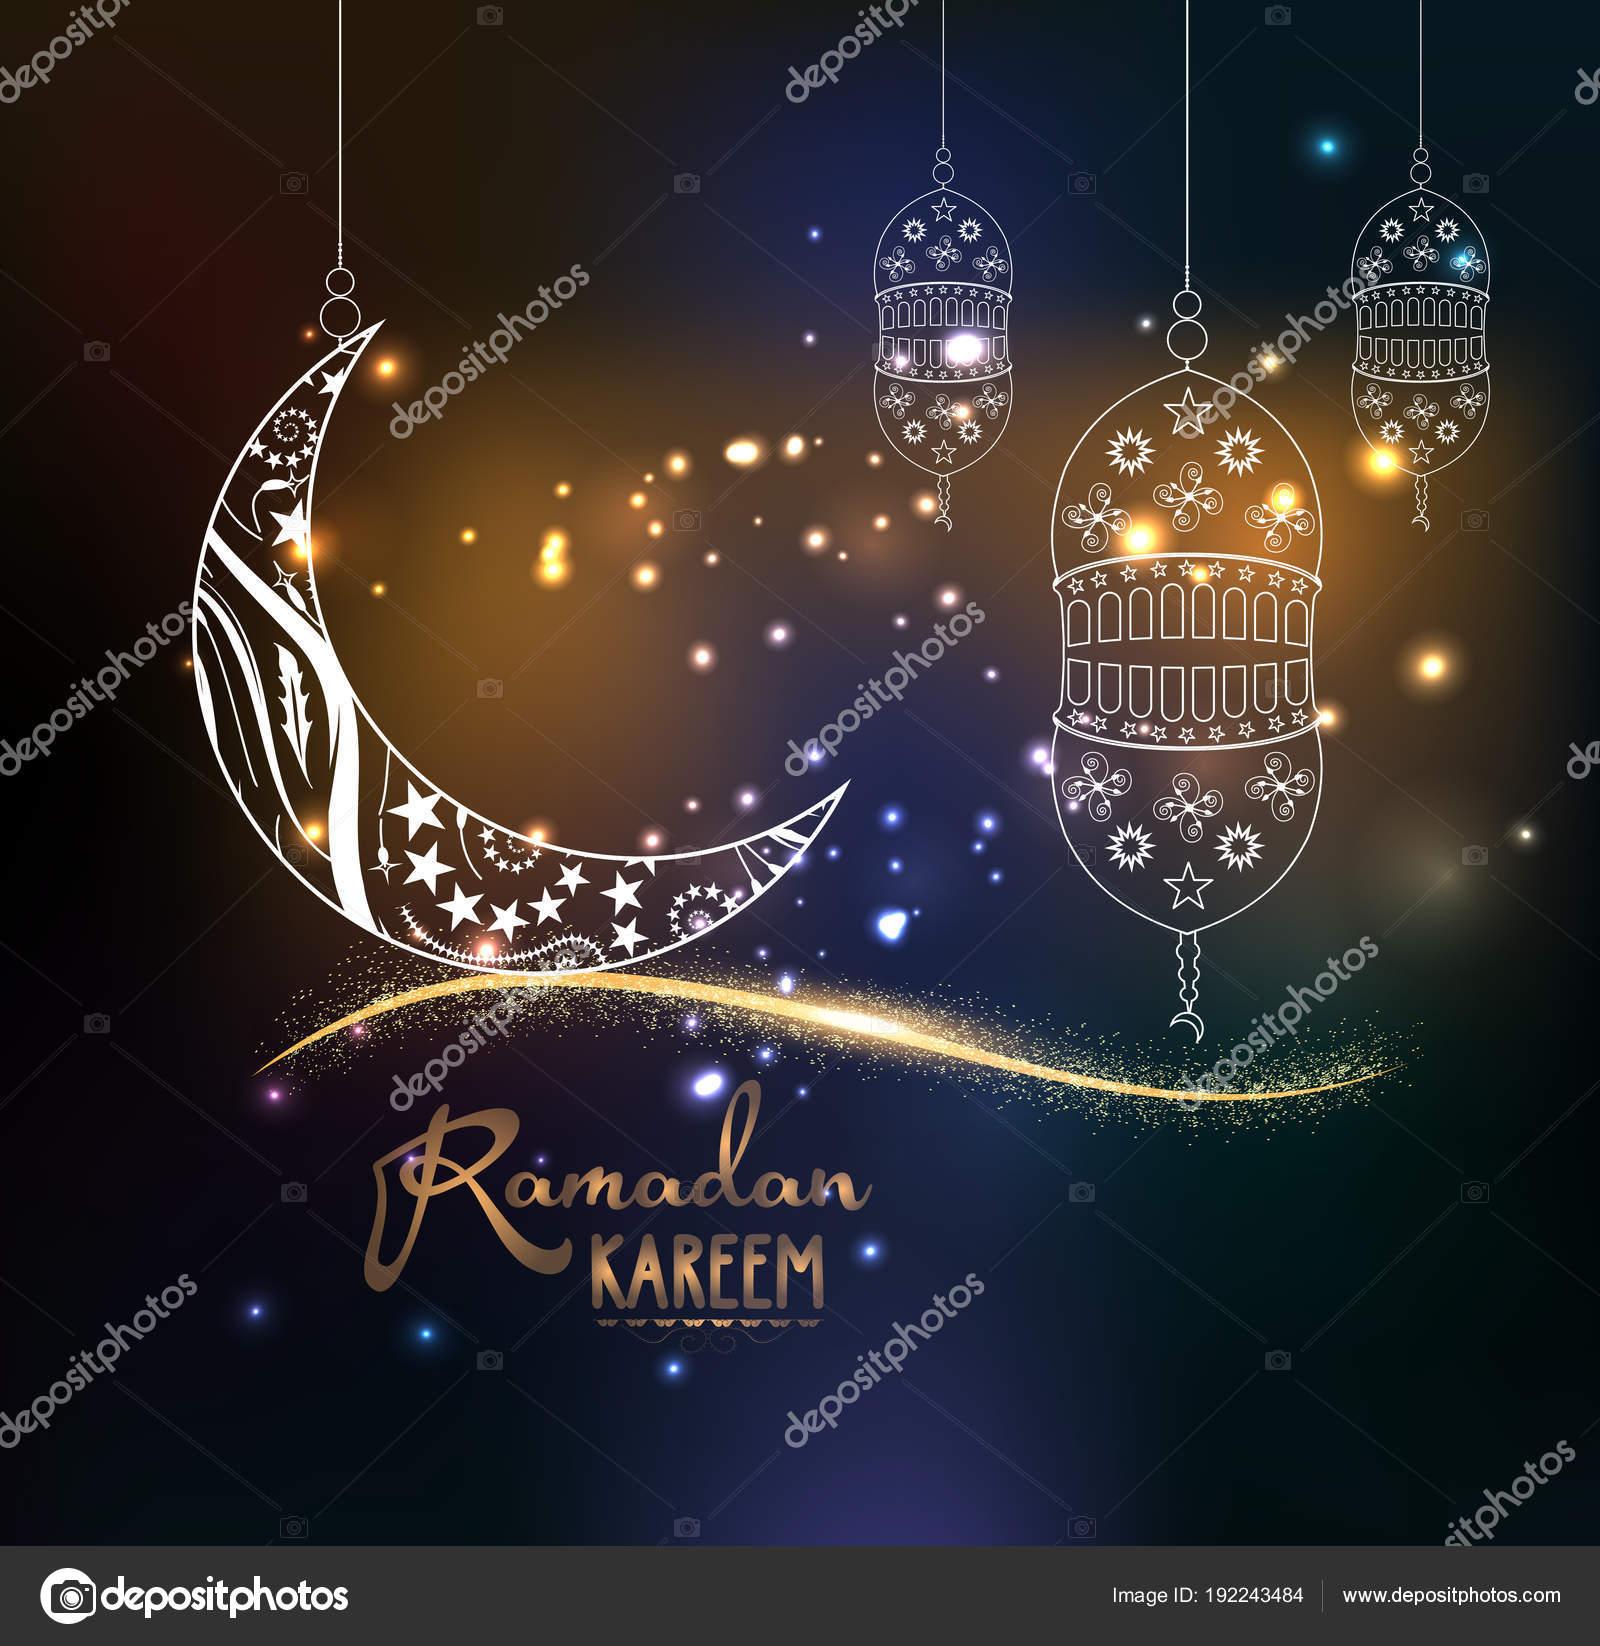 Eid Mubarak Ramadan Kareem Design Background Illustration Greeting